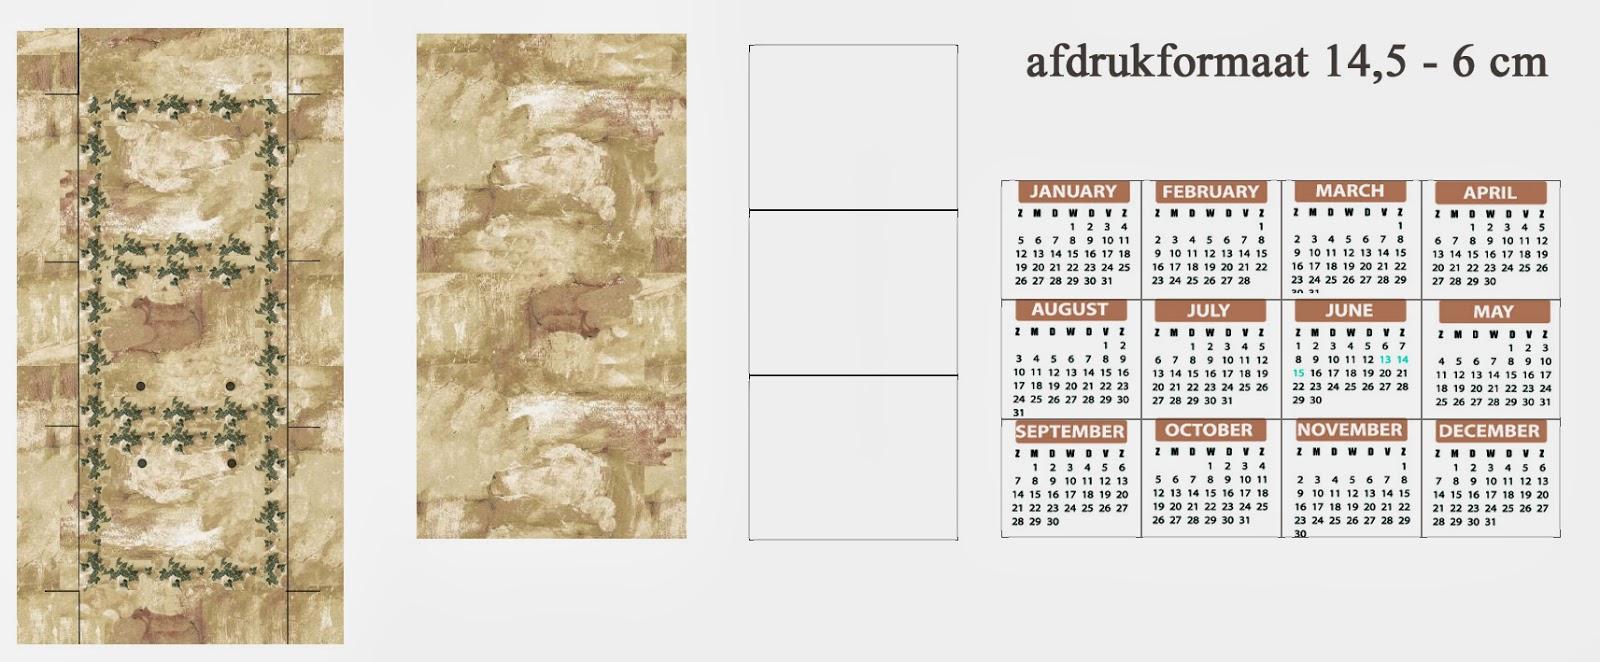 MINIDESIGN: Kalender 2014